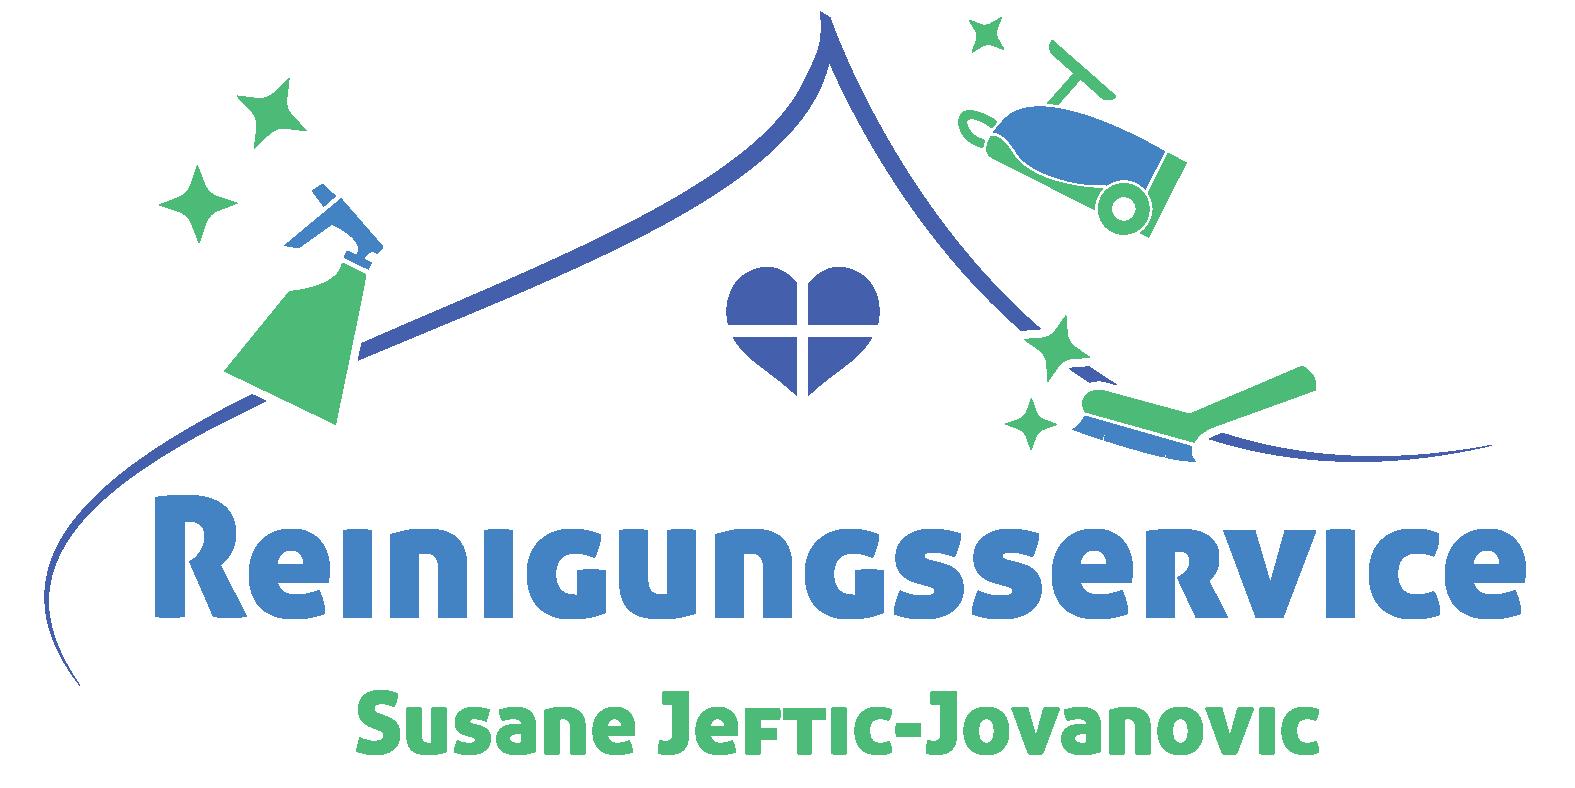 Reinigungsservice Susane Jeftic-Jovanovic